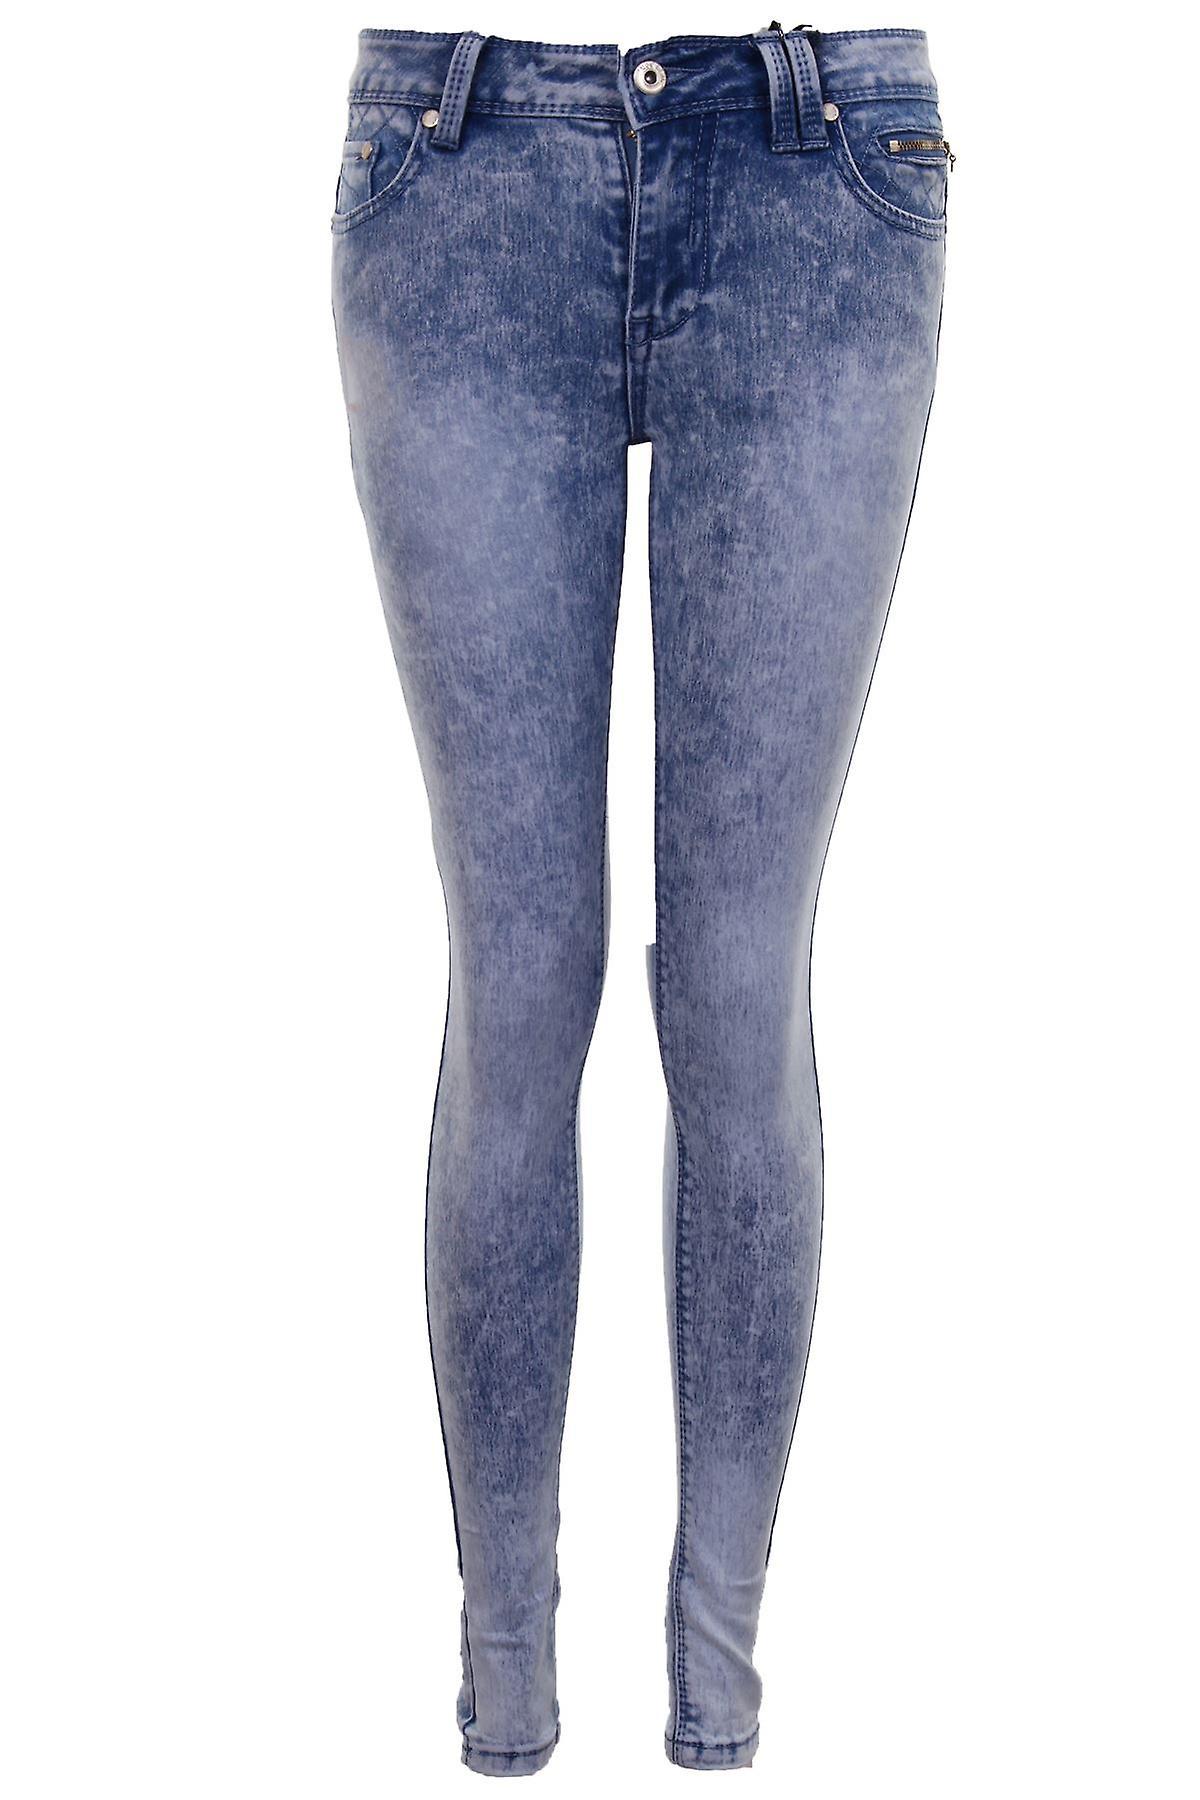 Ladies Bleached Faded Light Acid Wash Women's Denim Slim Skinny Fit Jeans